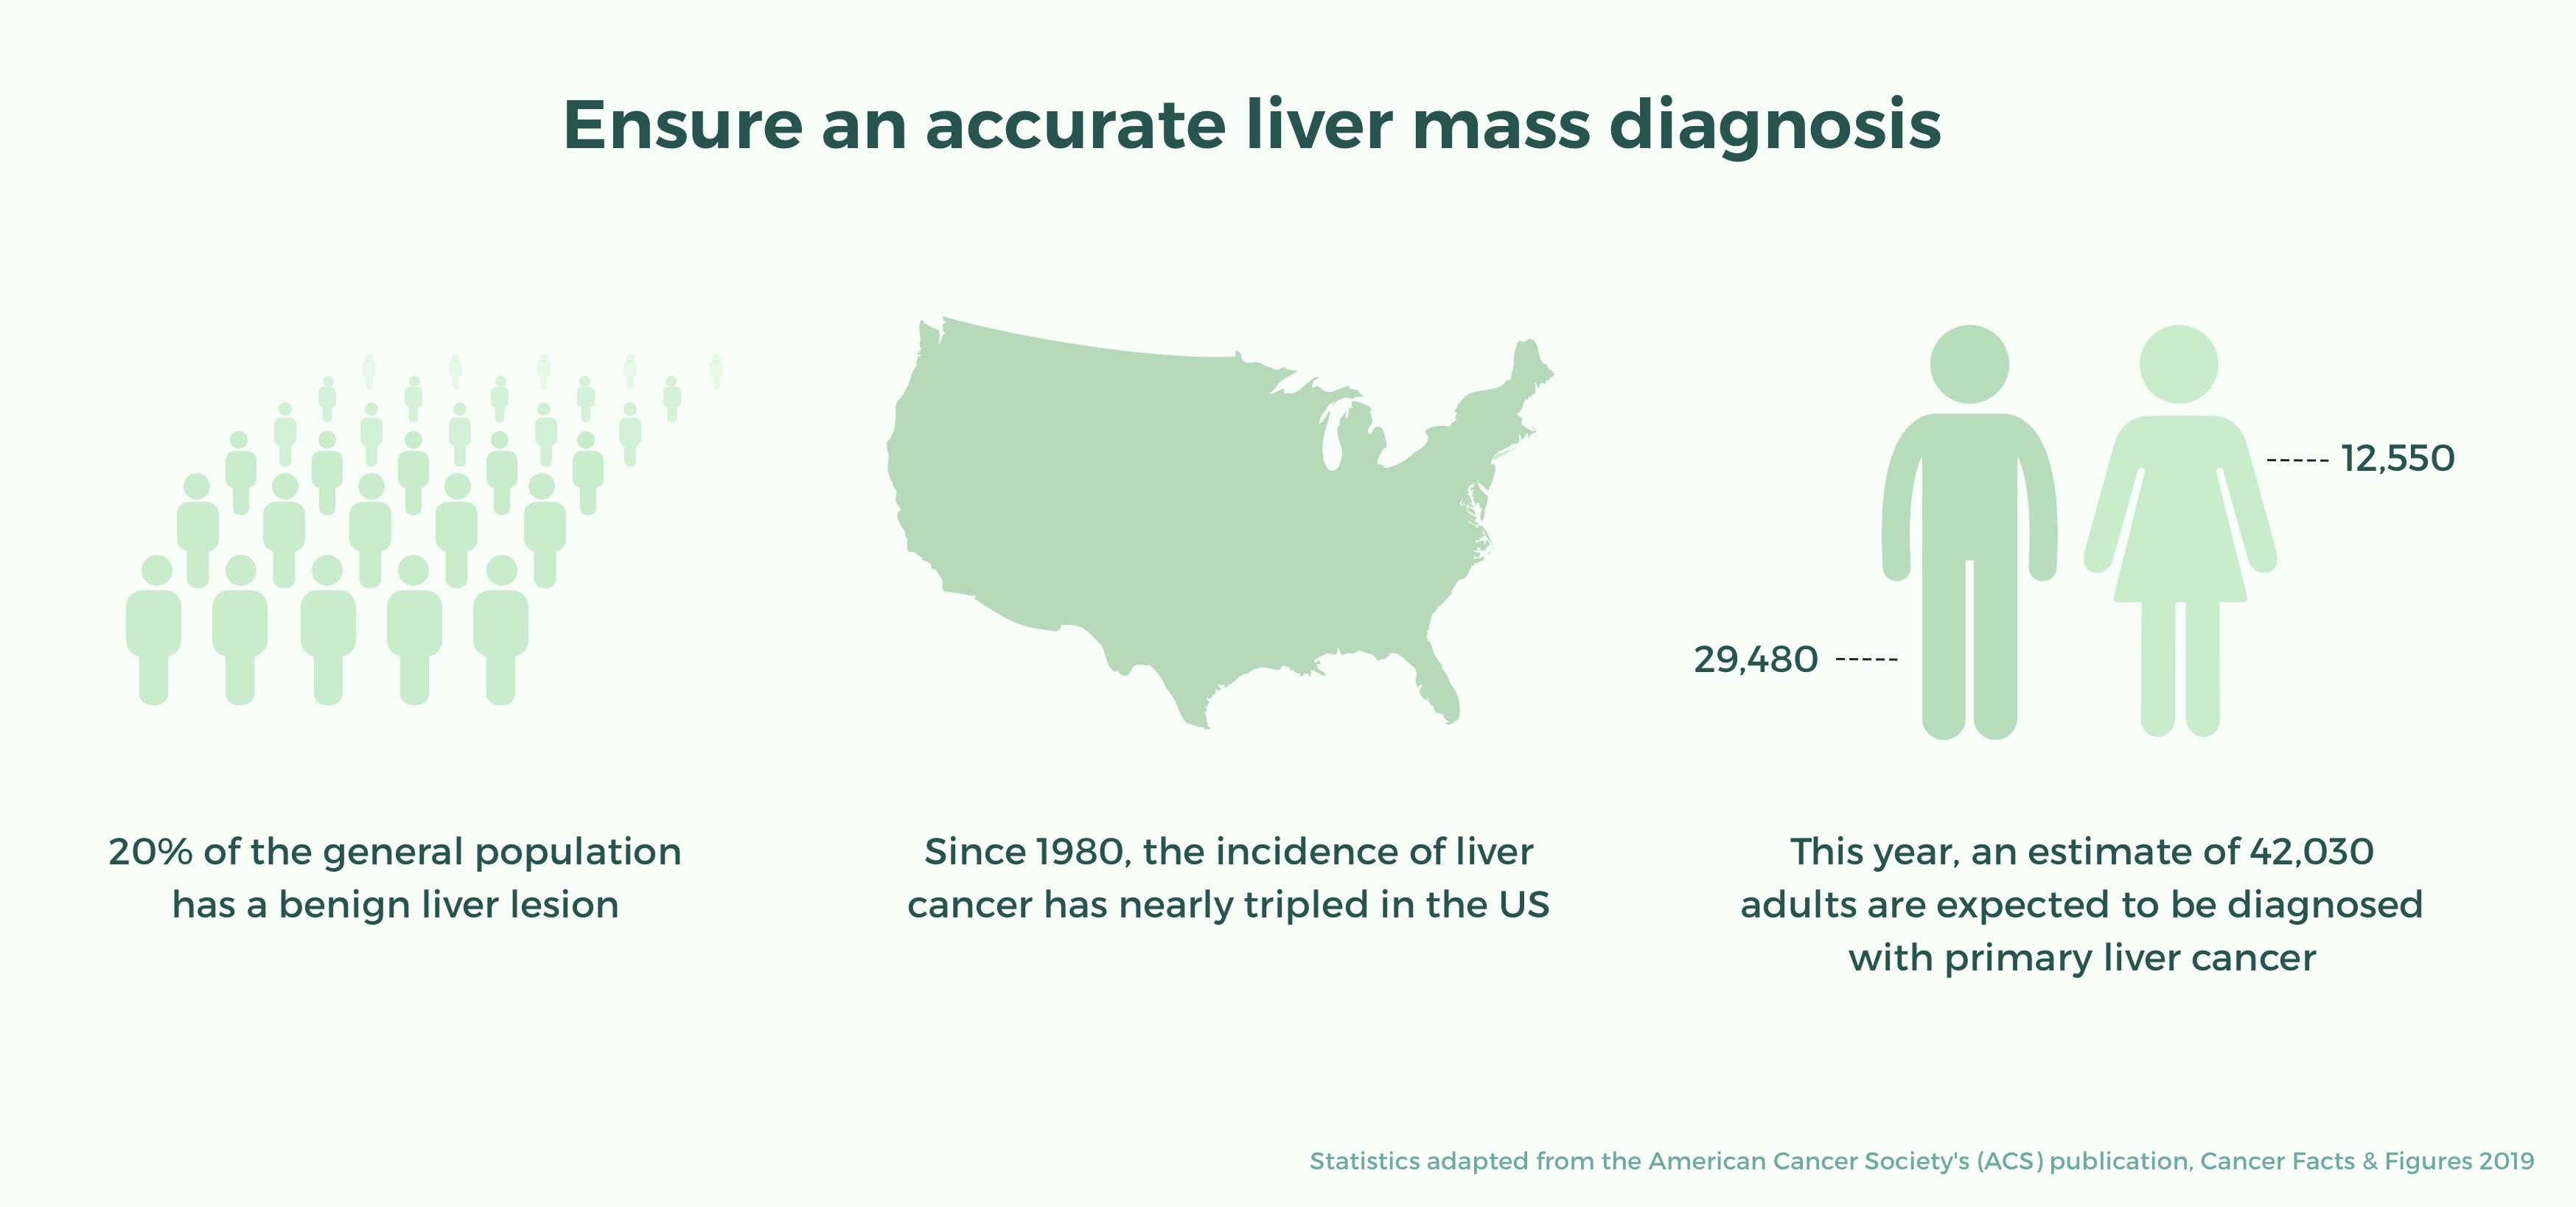 infographic_livermass.jpg